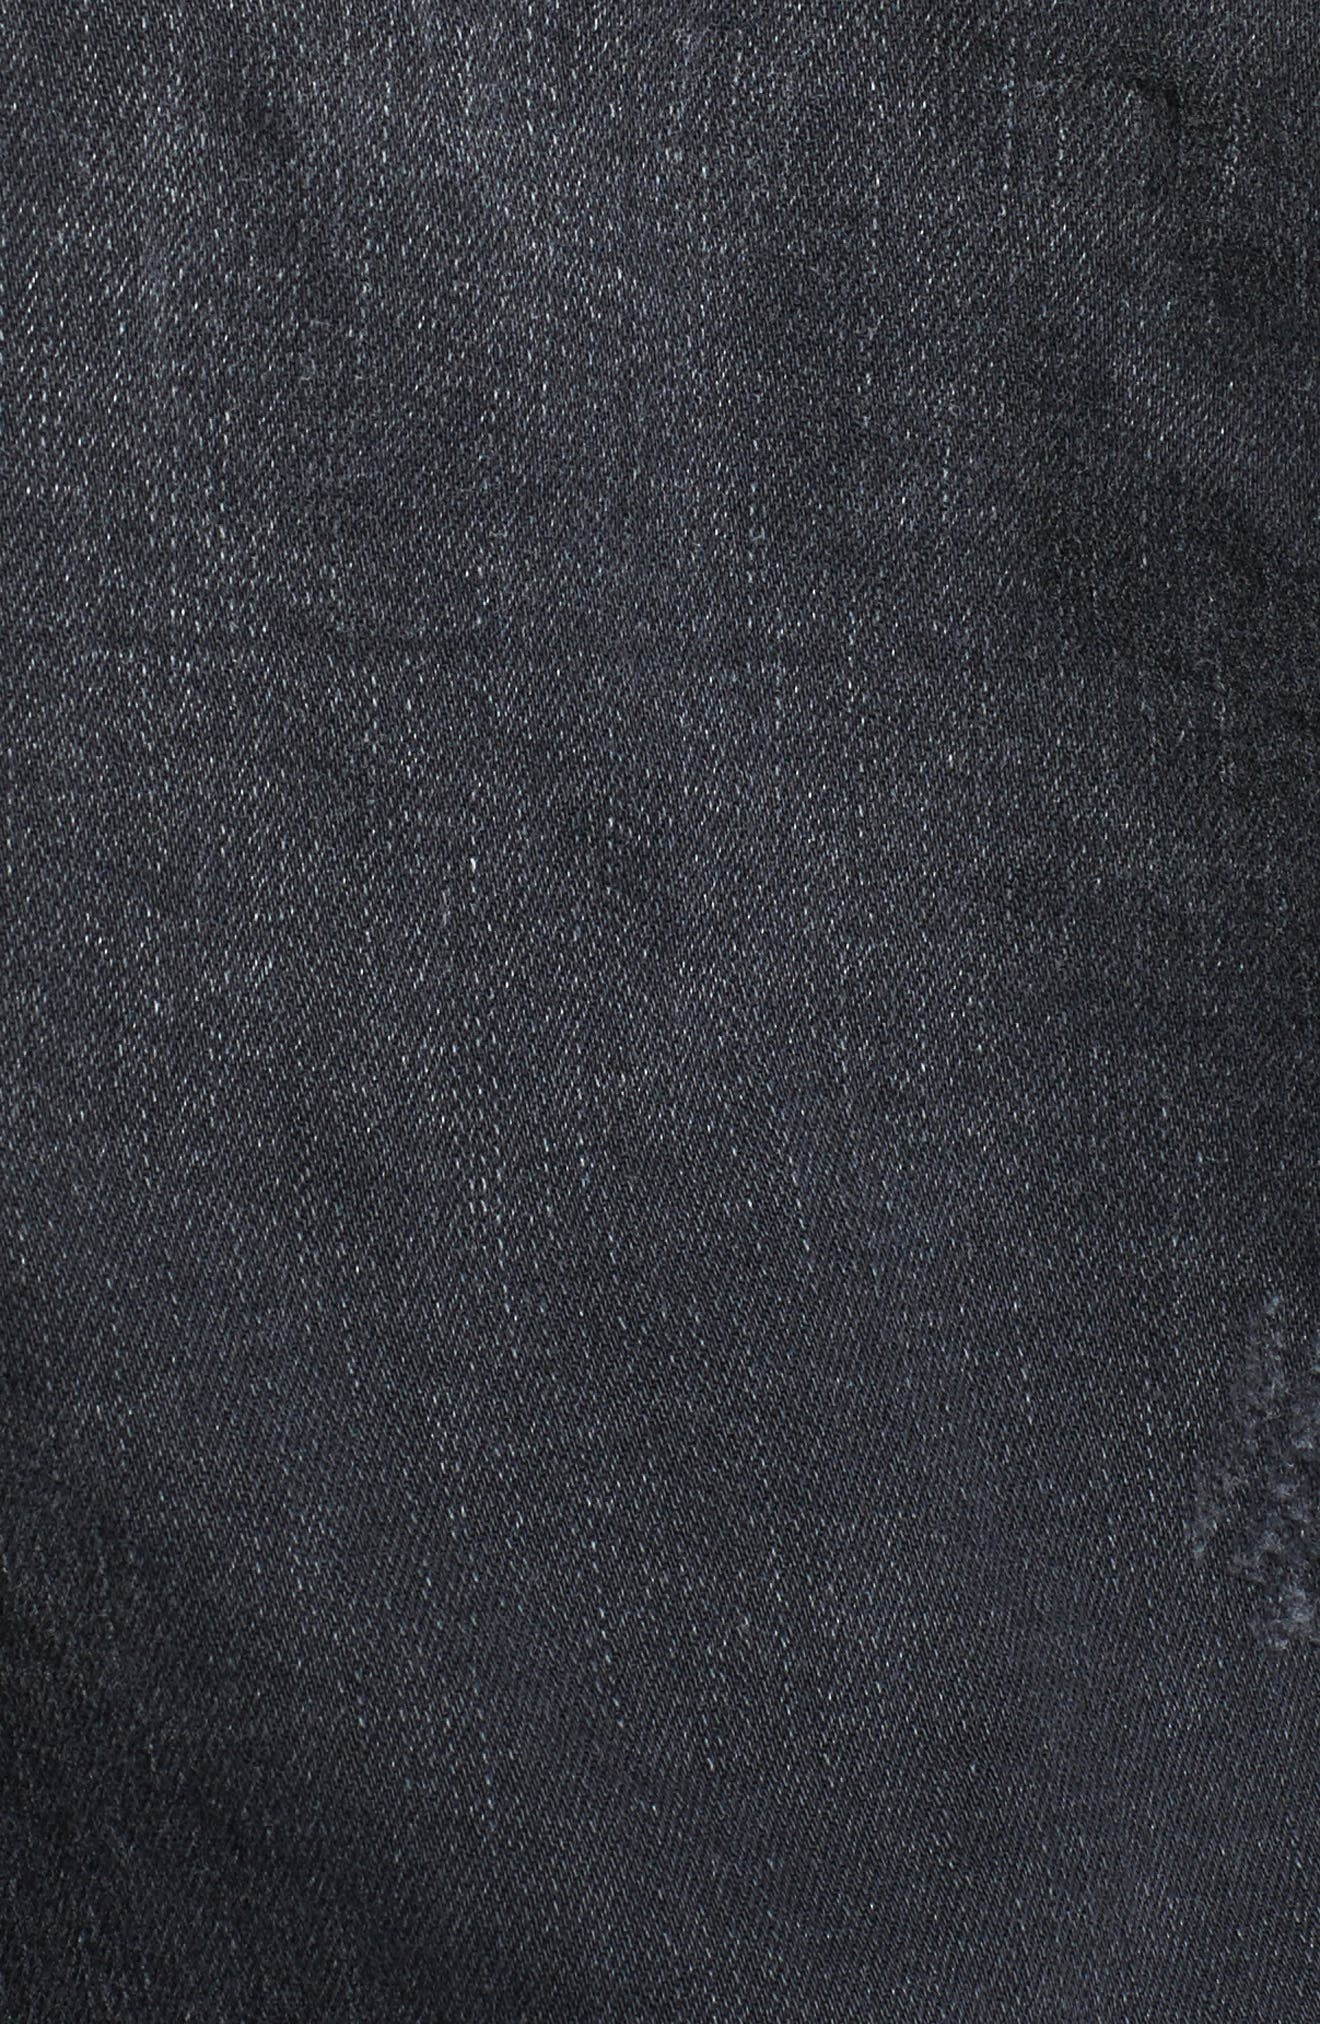 True Religion Danni Destroyed Denim Jacket,                             Alternate thumbnail 6, color,